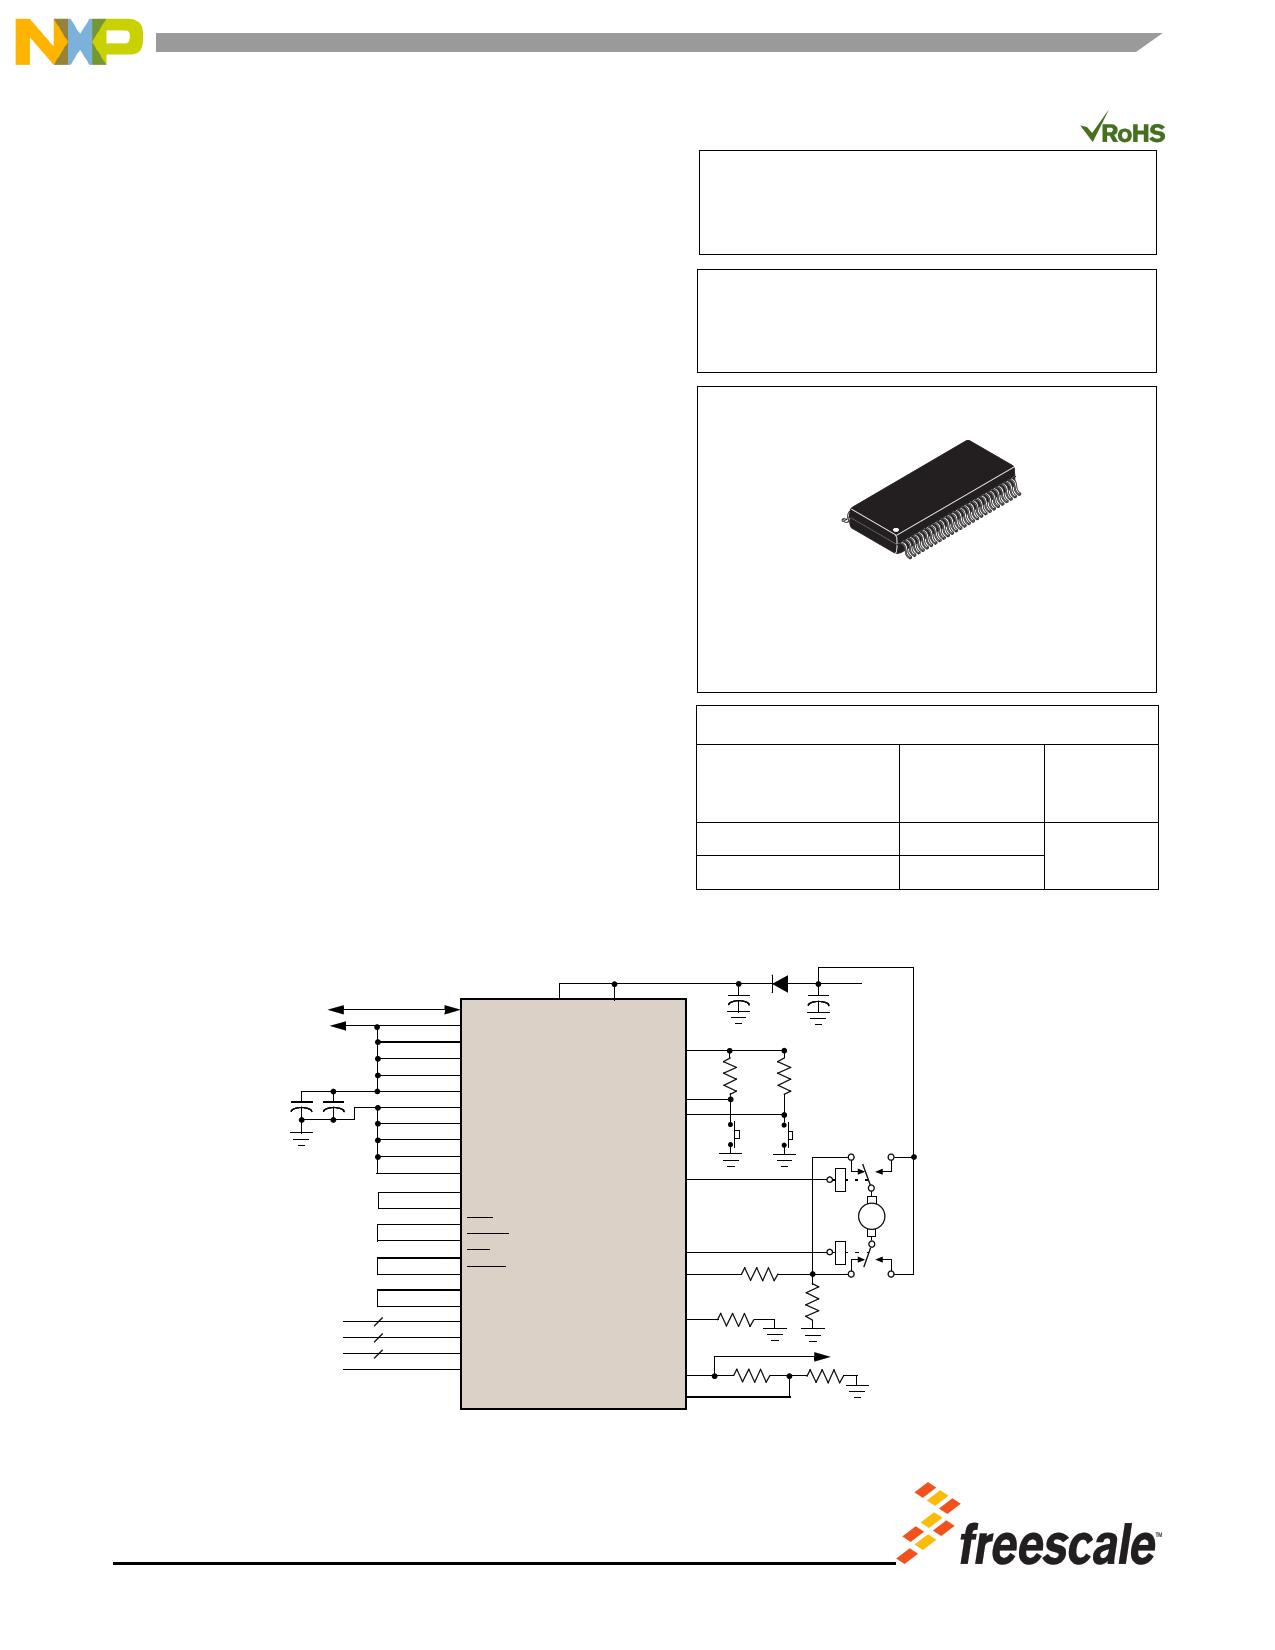 908E624 datasheet